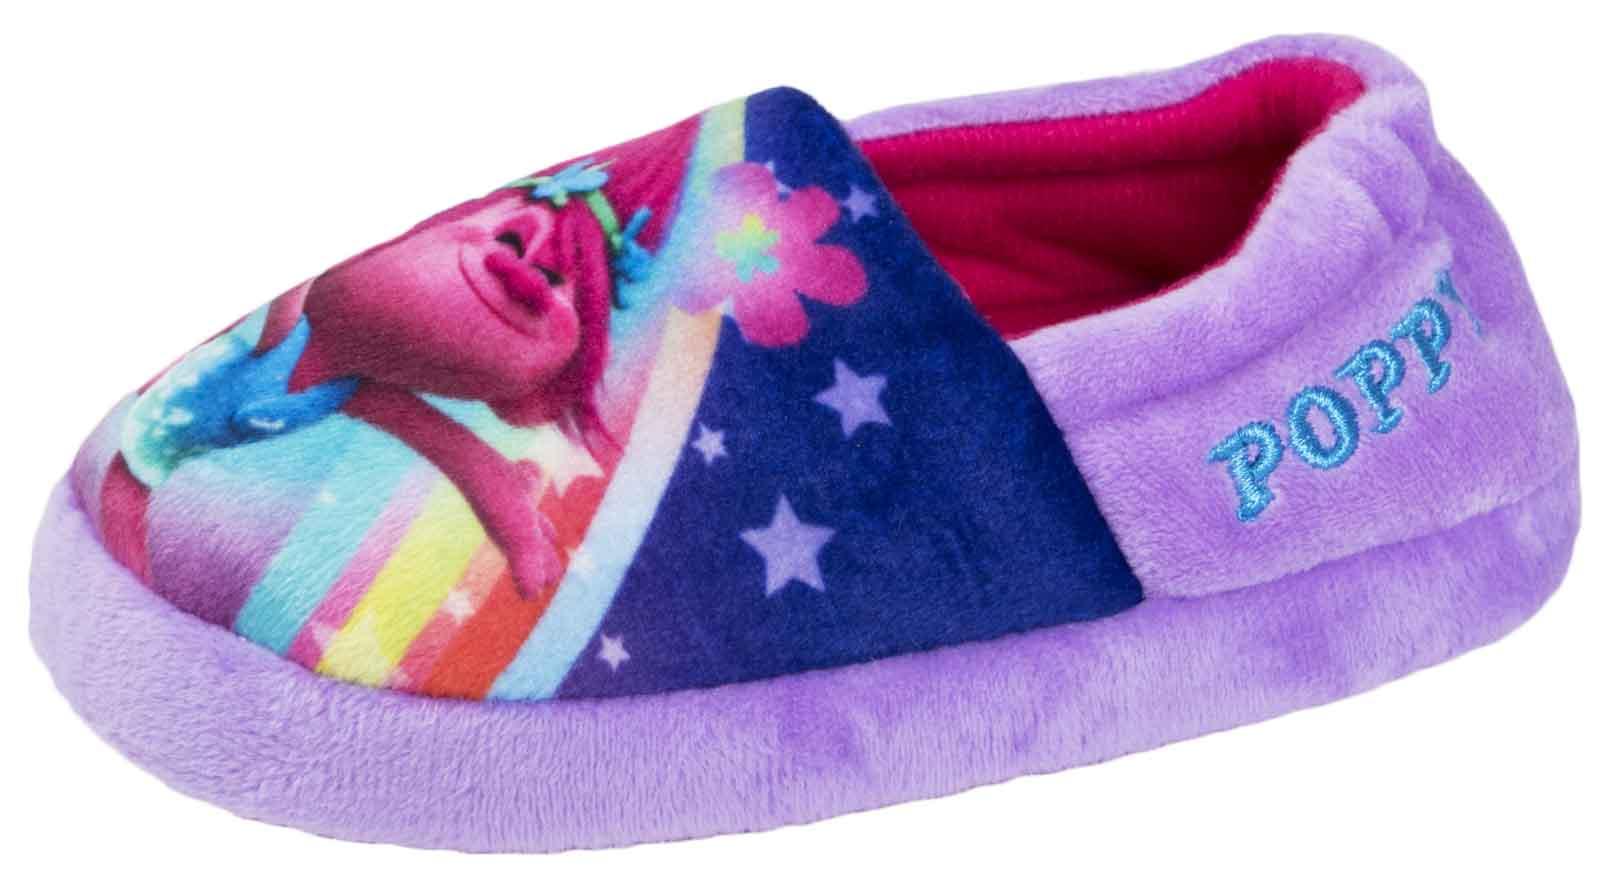 Girls Trolls Slippers Slip On Mules Purple Rainbow Booties Comfort Shoes Size